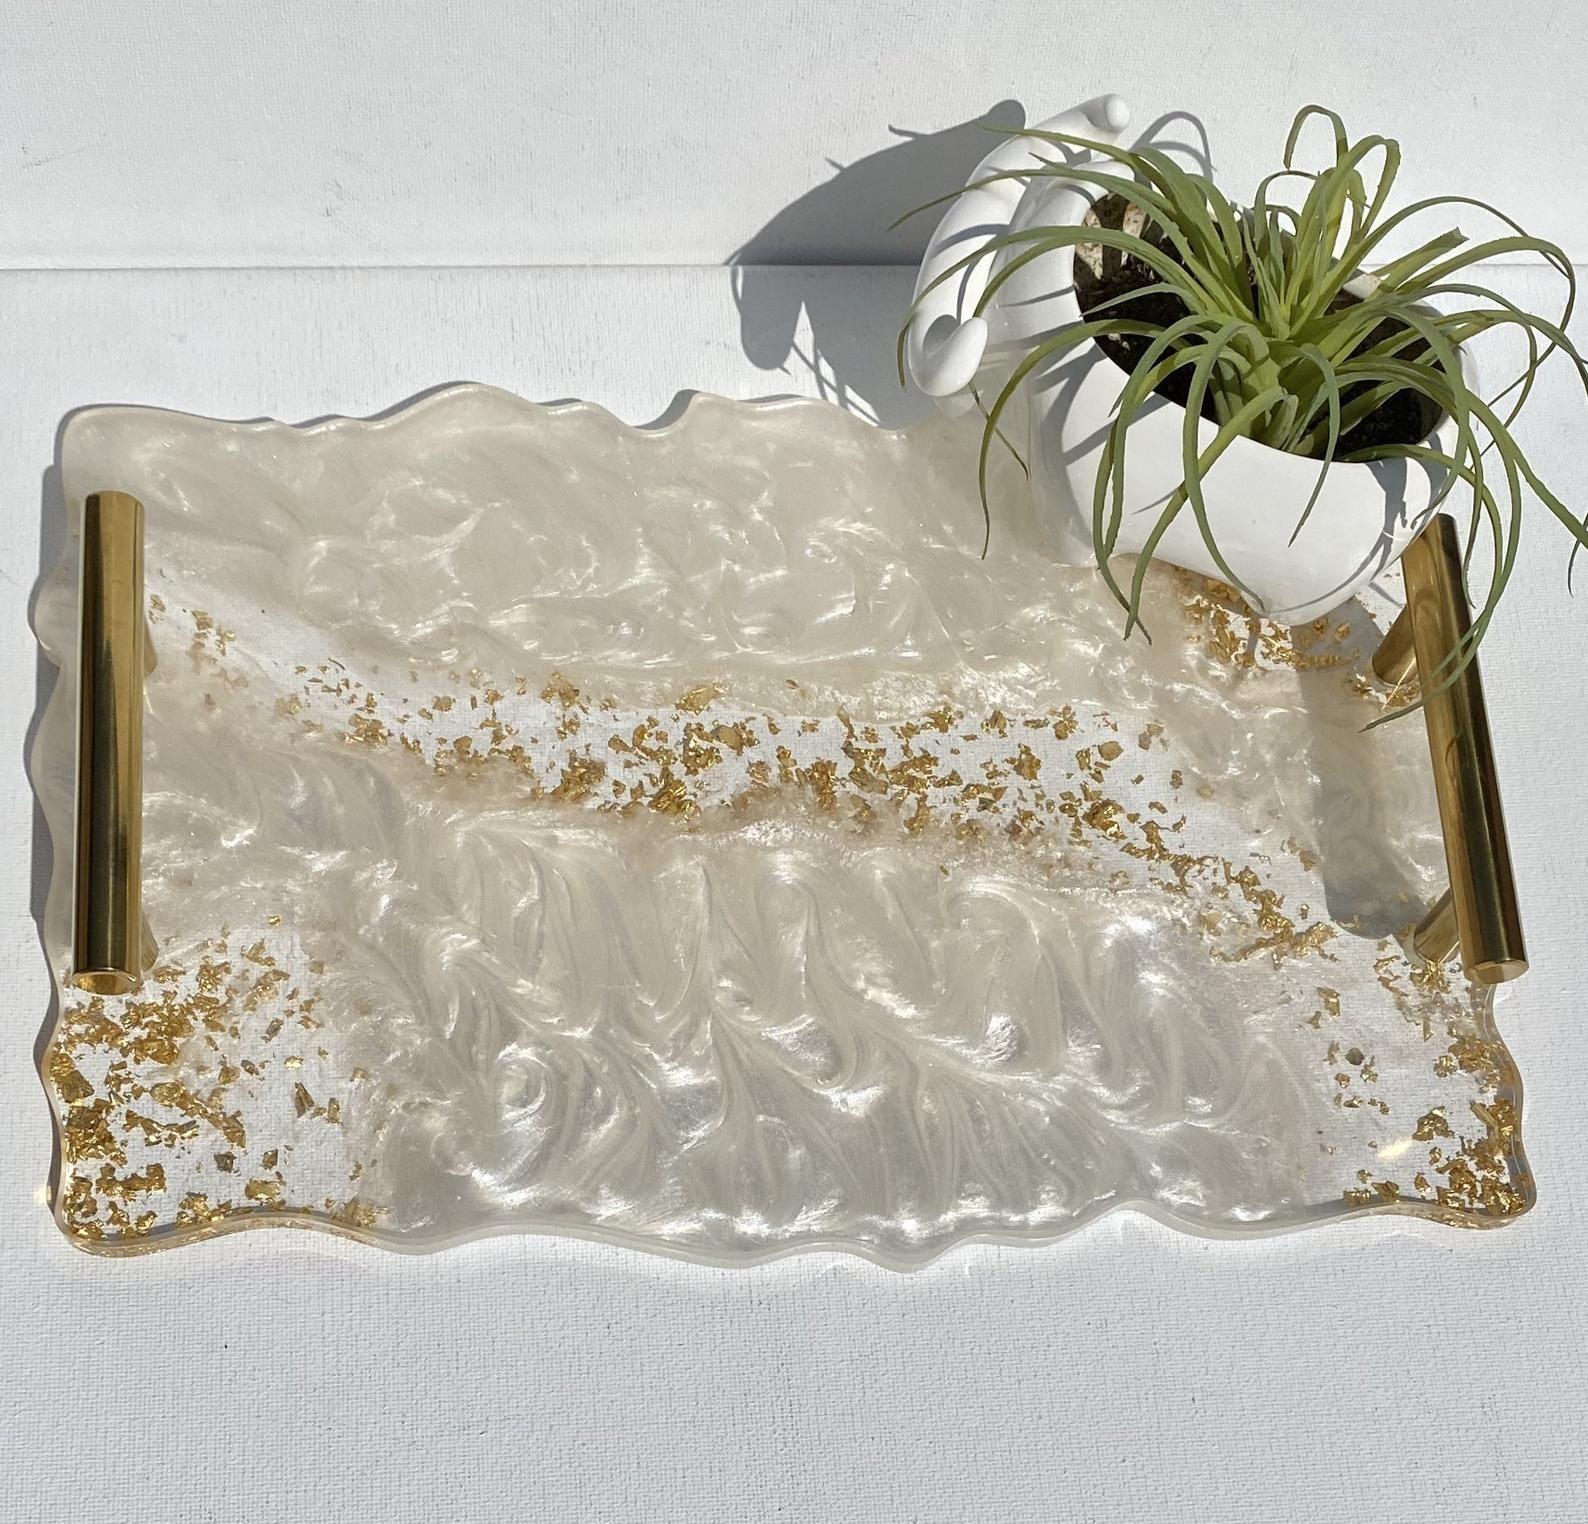 Geode agate Moonstone white resin decorative servi